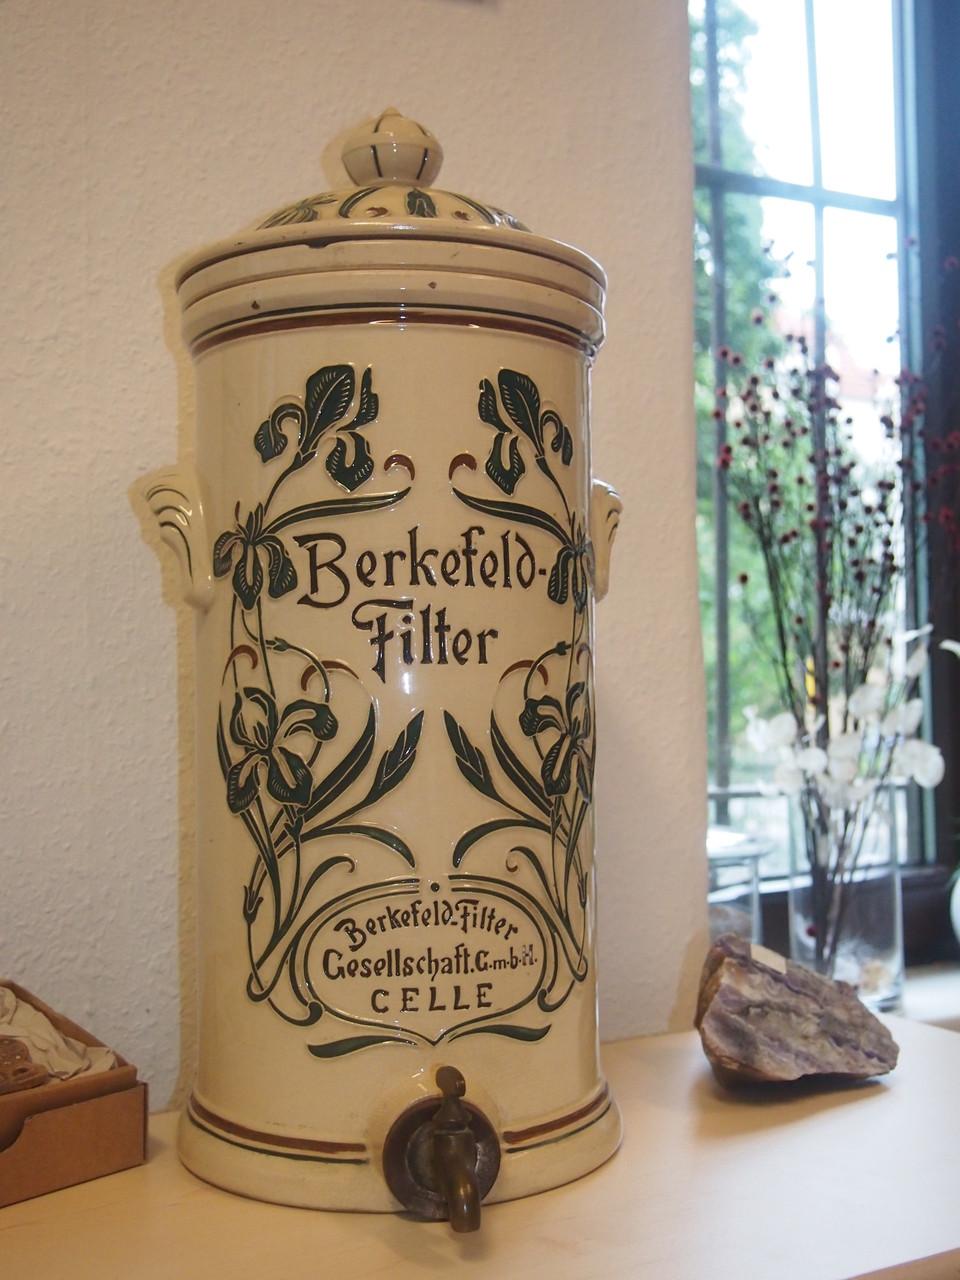 Berkefeld-Filter